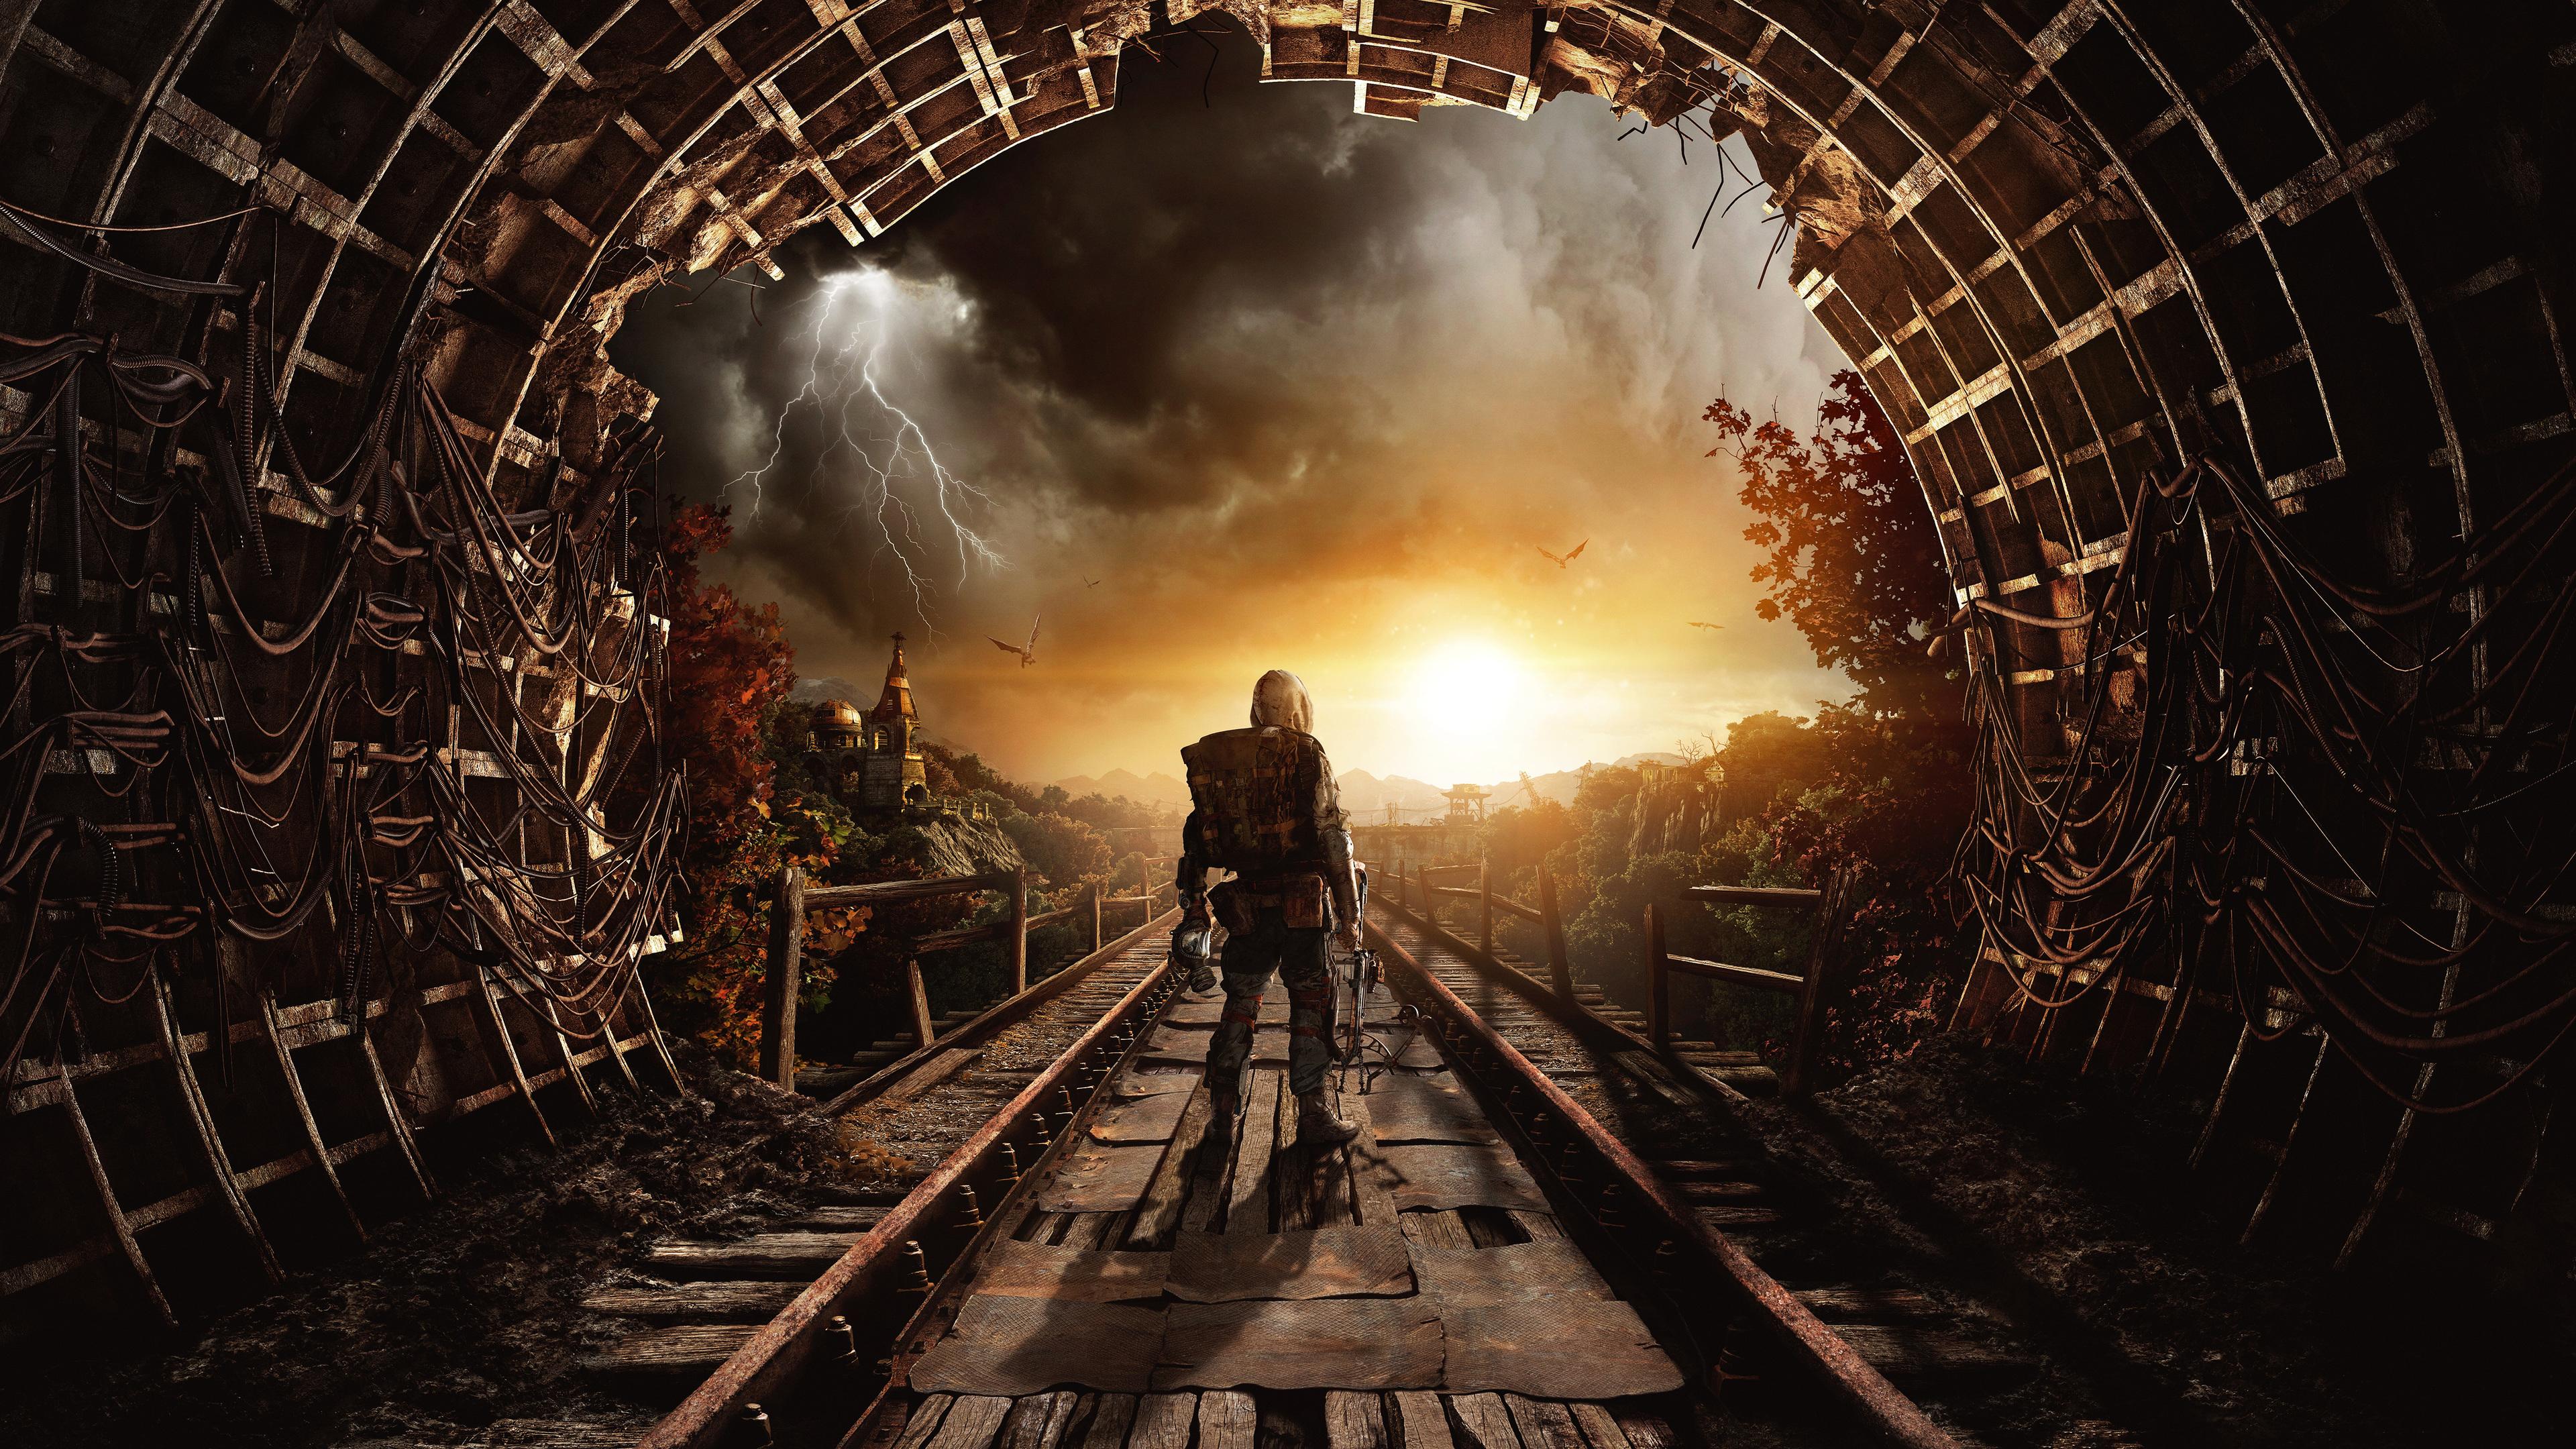 metro exodus 2018 5k 1537691978 - Metro Exodus 2018 5k - metro exodus wallpapers, hd-wallpapers, games wallpapers, 5k wallpapers, 4k-wallpapers, 2018 games wallpapers